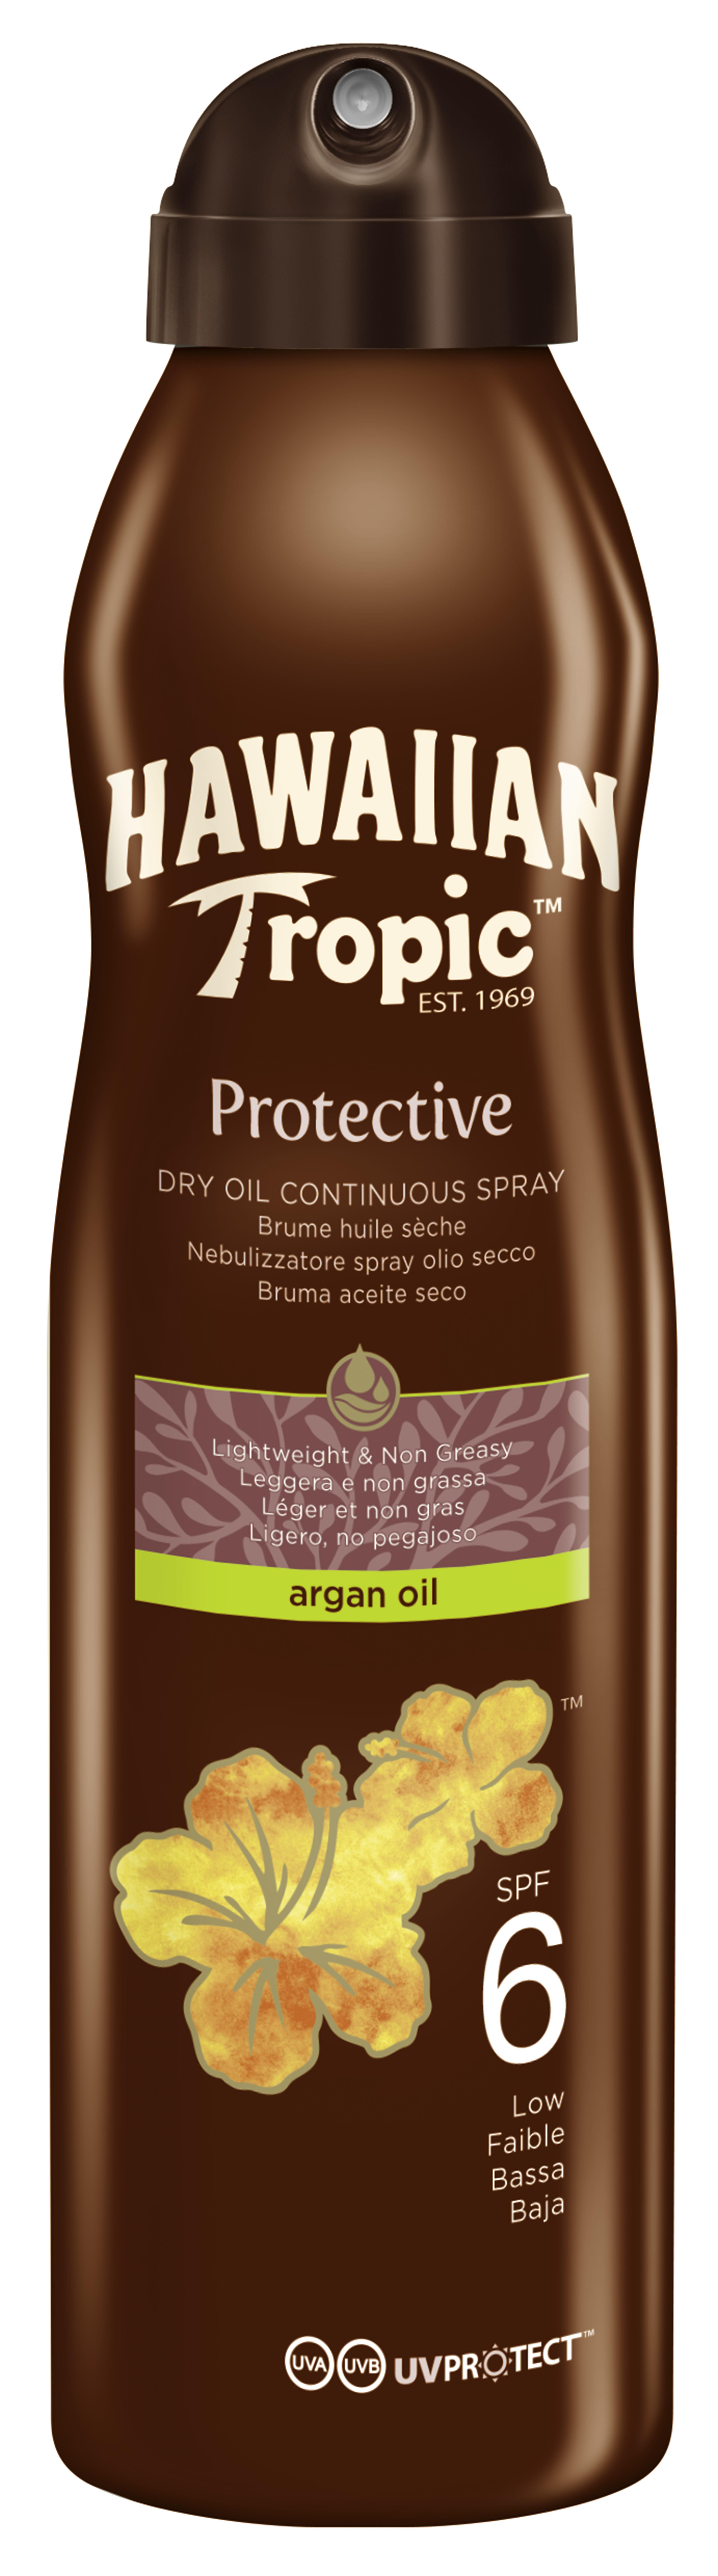 Protective Oil Dry Oil Argan C-Spray SPF 6